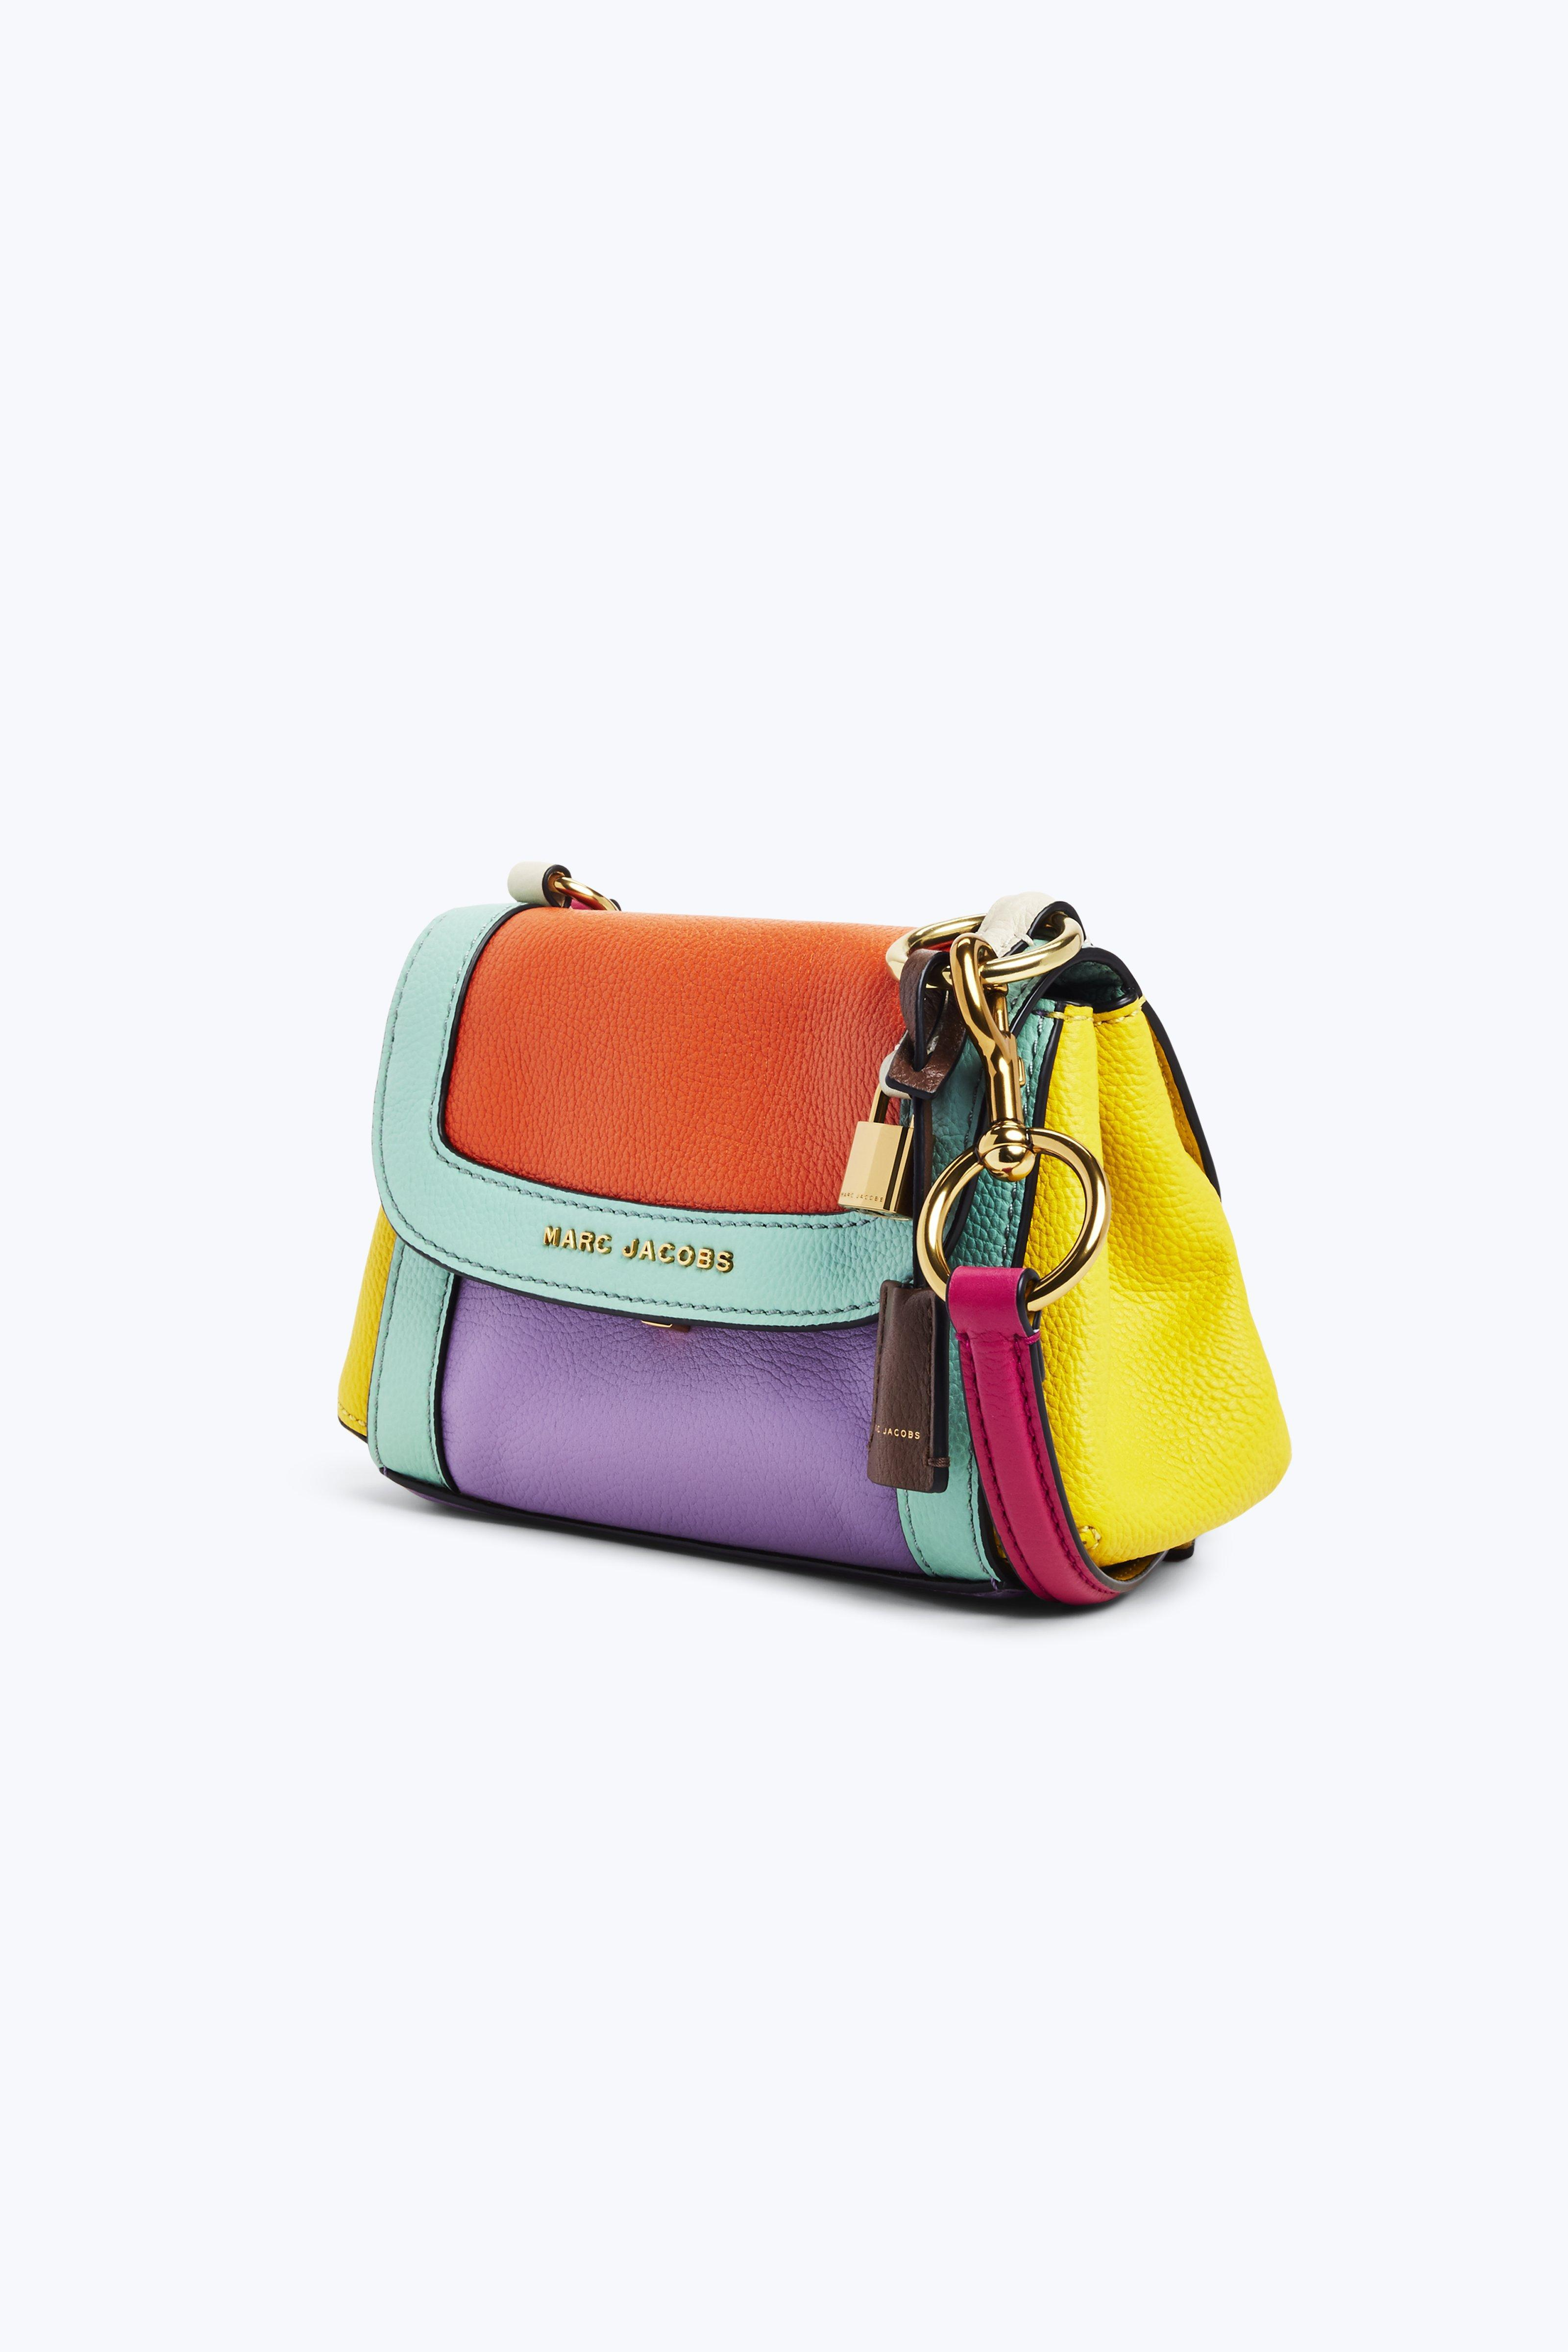 70d6155c29d4b Lyst - Marc Jacobs The Colorblocked Mini Boho Grind